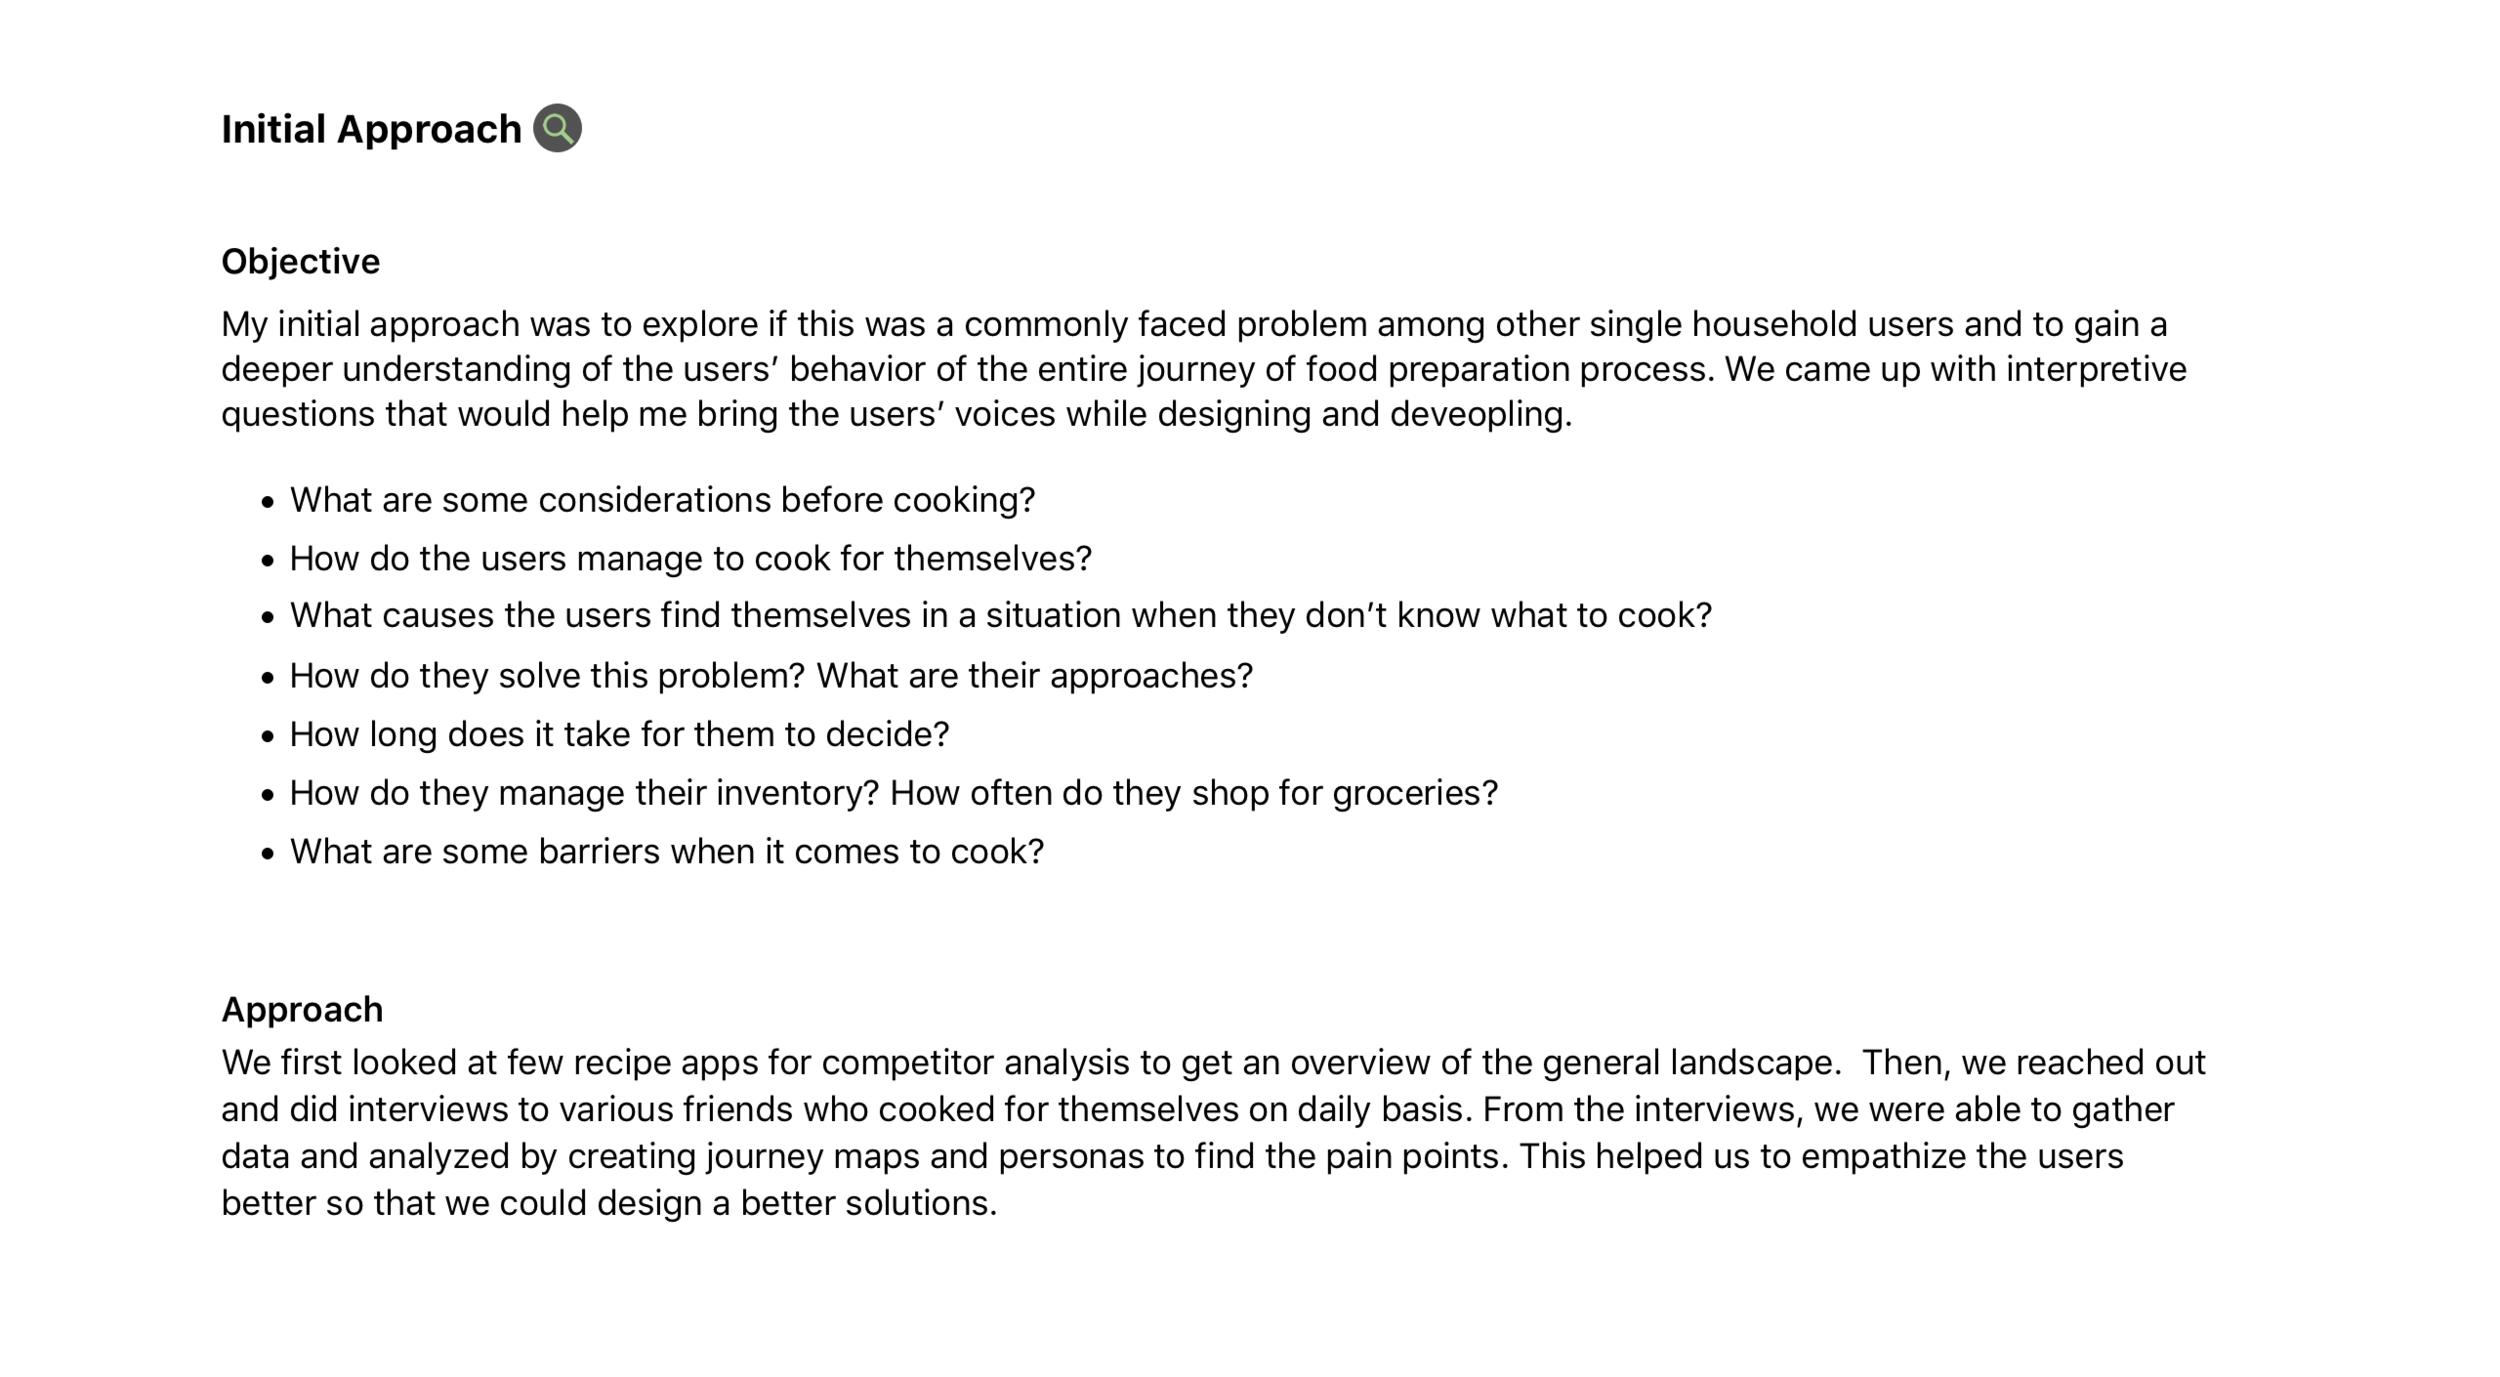 Behavior Pattern Research Copy 2@2x.png